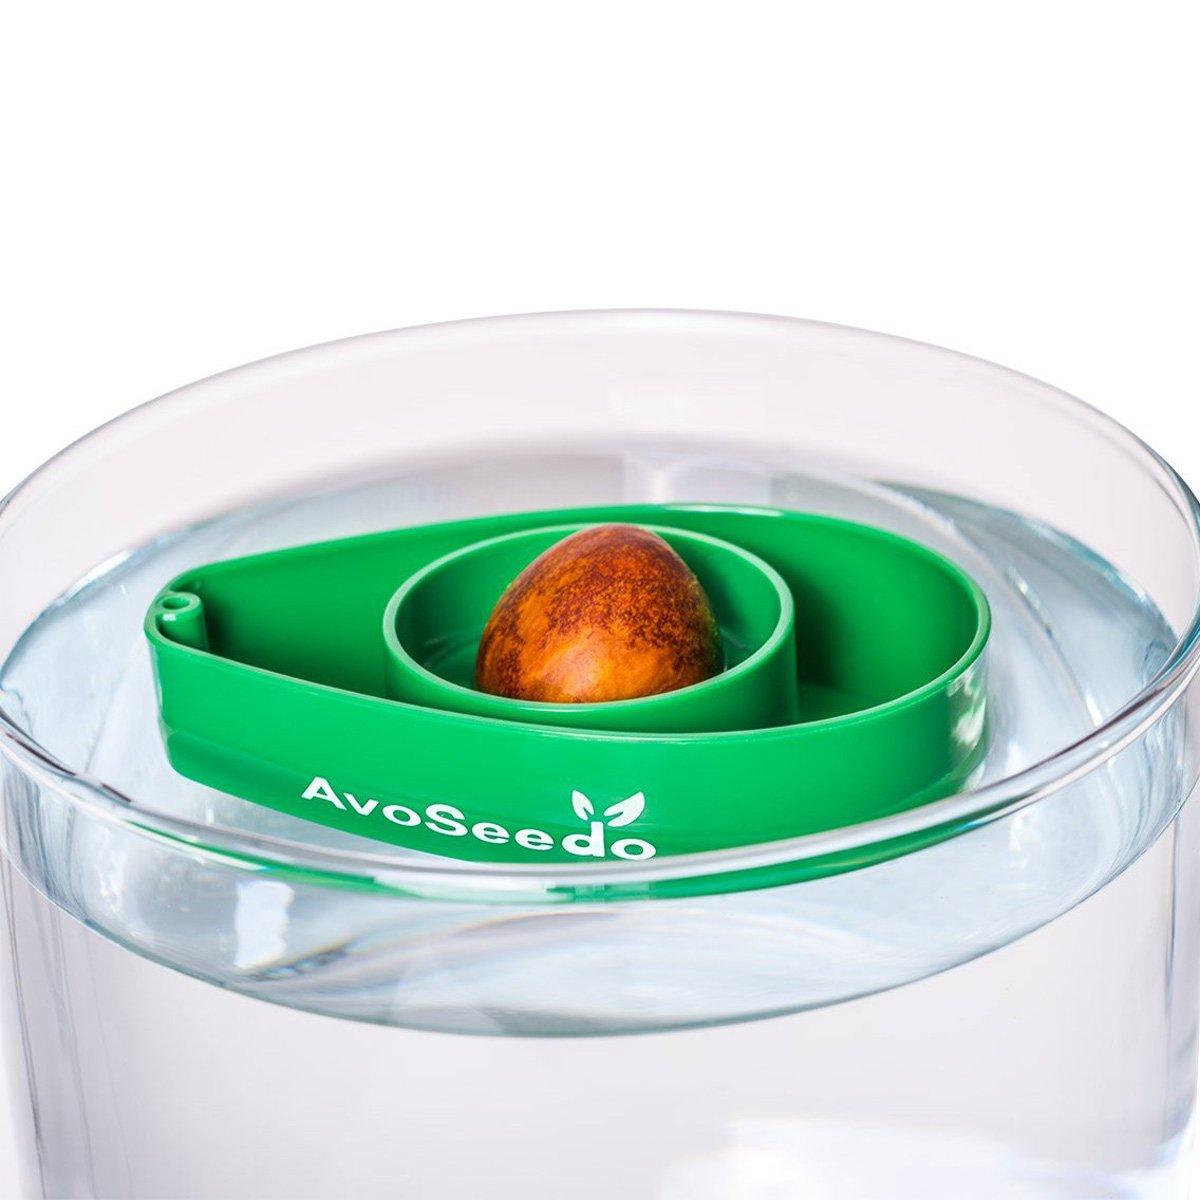 Avoseedo grow your own avocado tree the green head for Grow your own avocado tree from seed